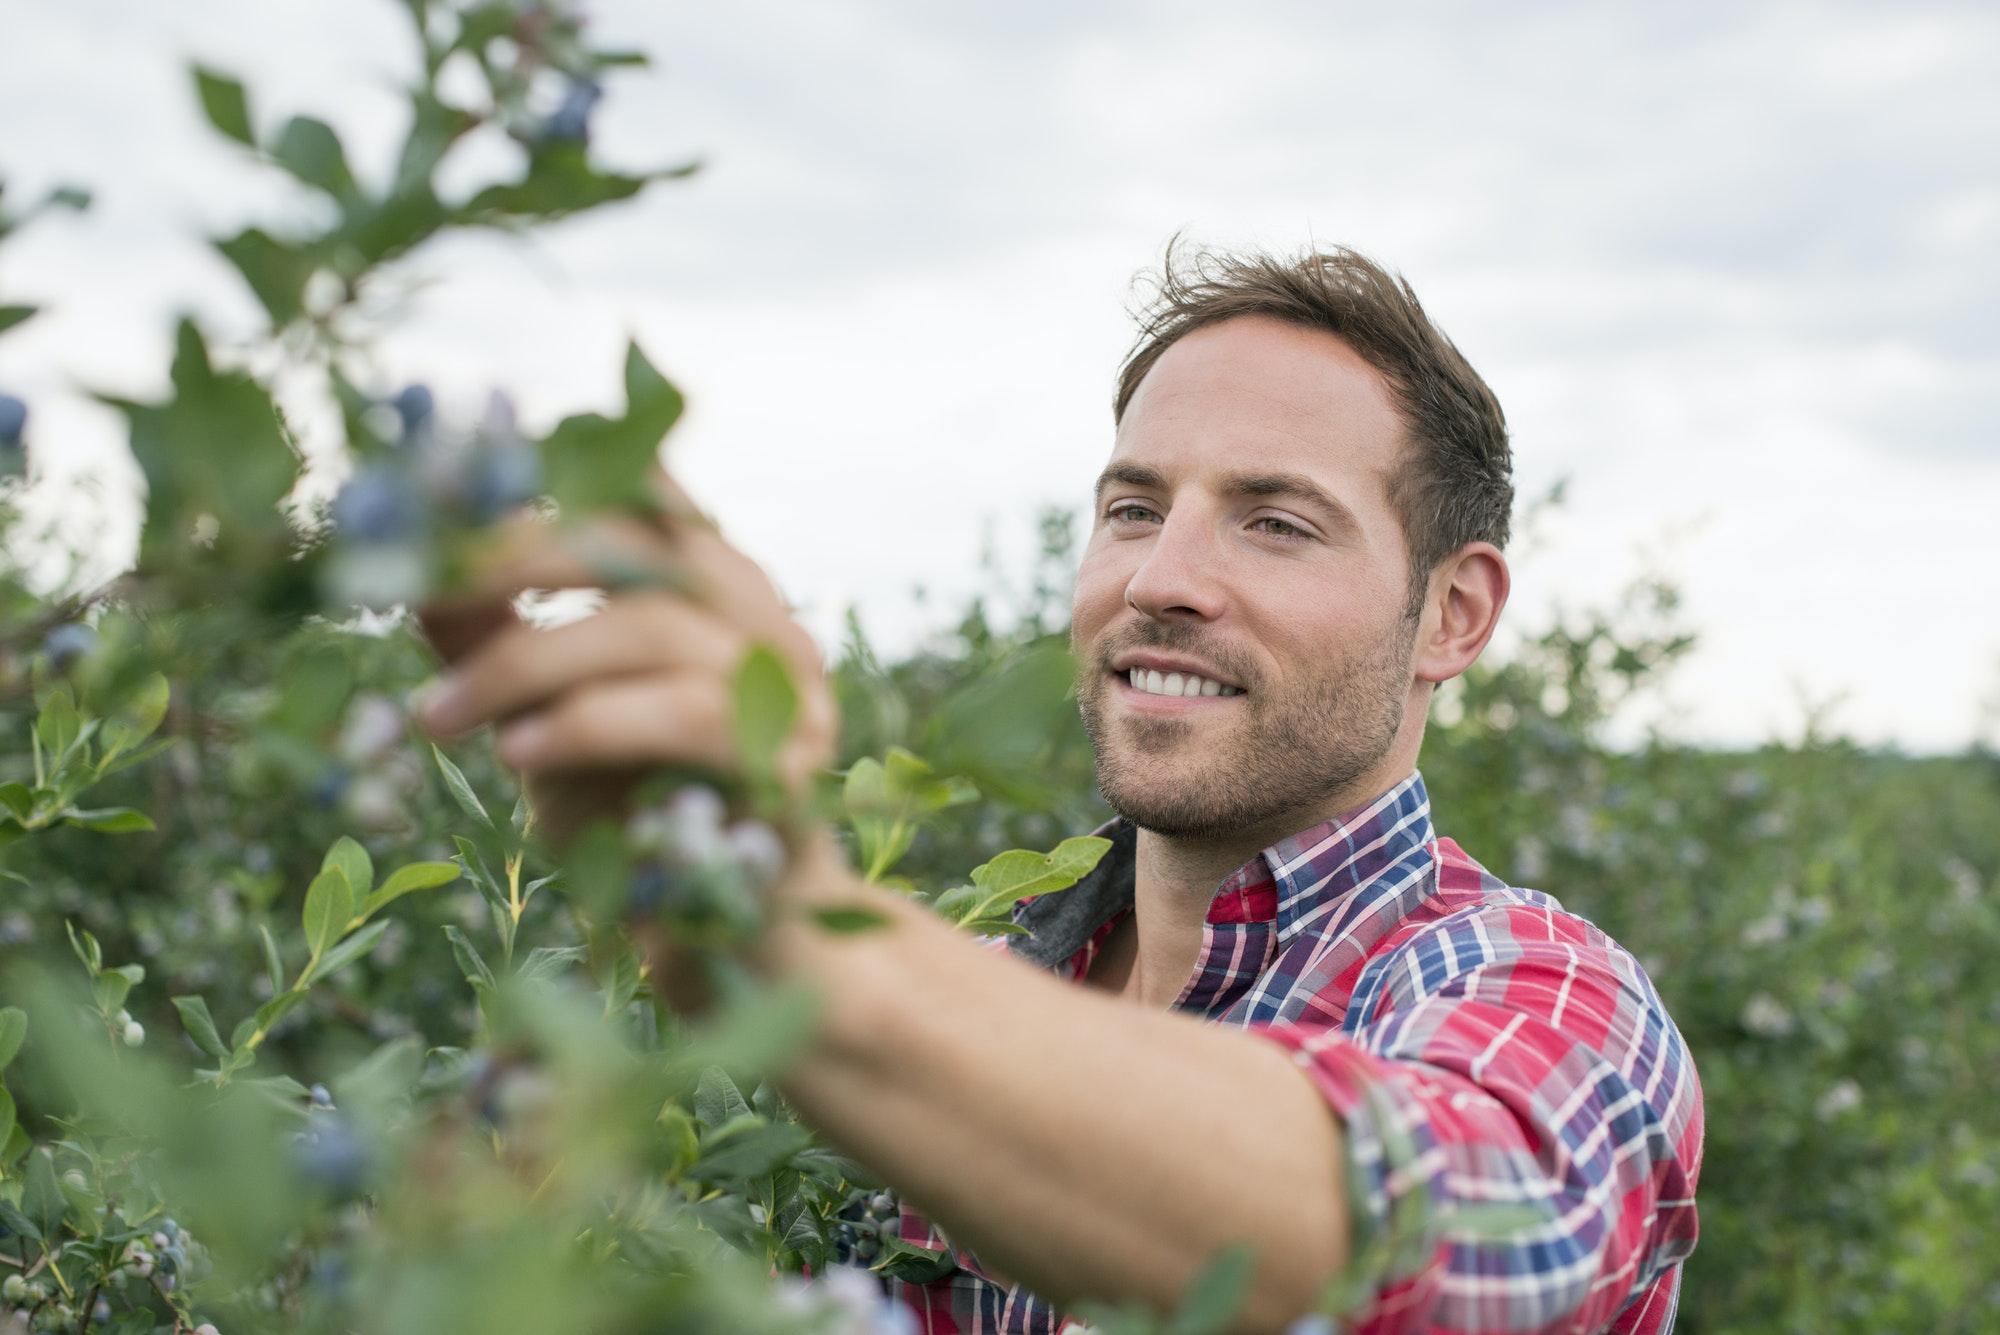 Organic fruit orchard. A man picking blueberries, Cyanococcus, fruit.